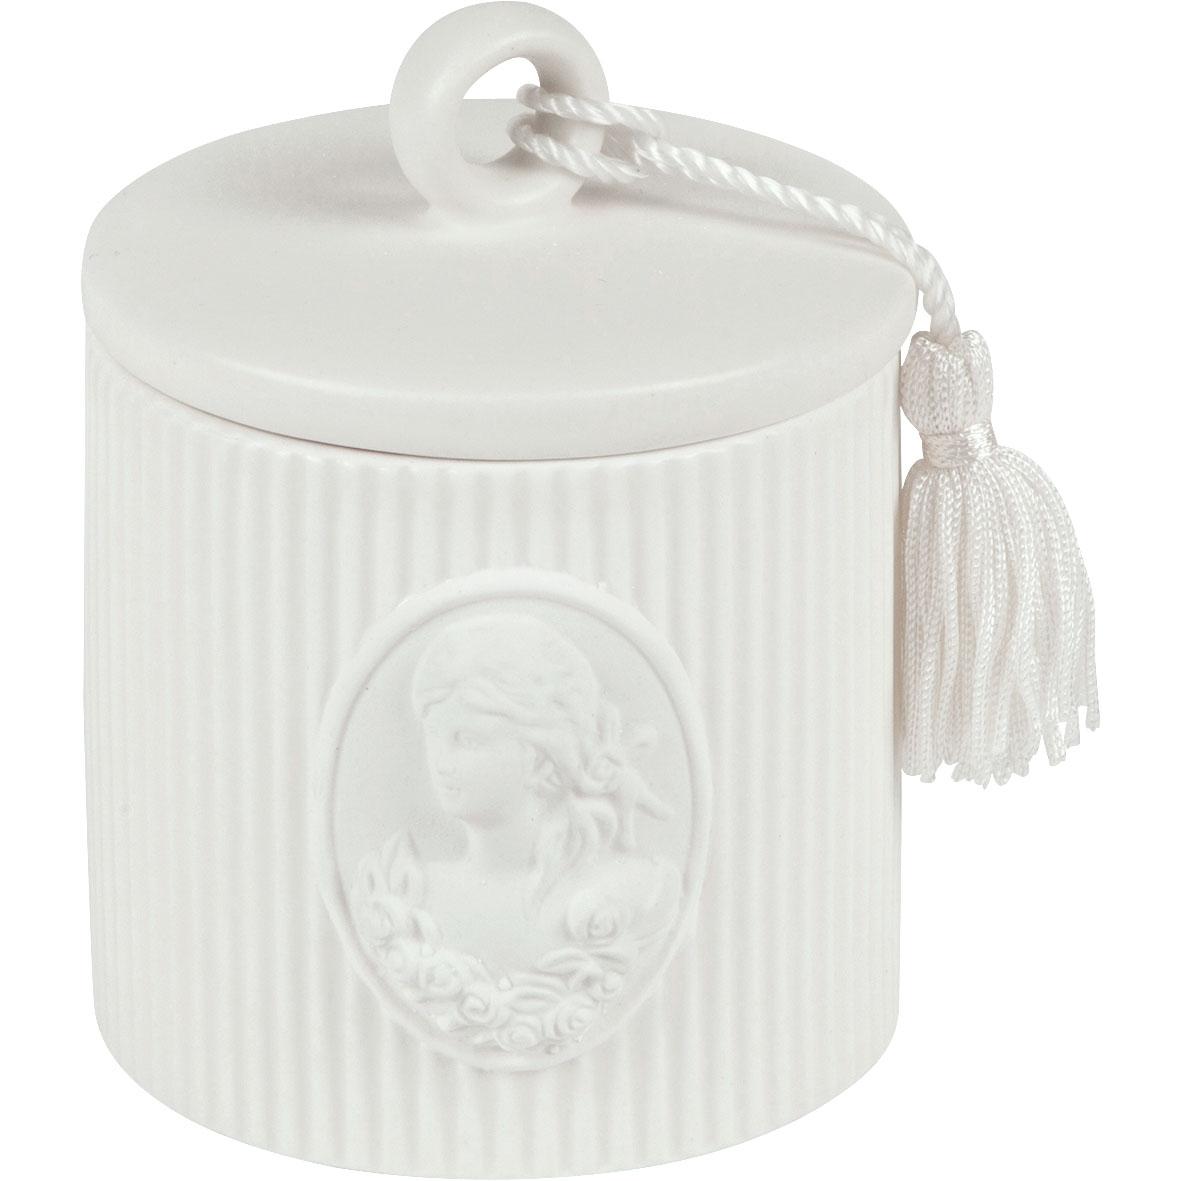 Set due barattoli porta cotone, in ceramica bianca, Linea Marquise di Mathilde M.